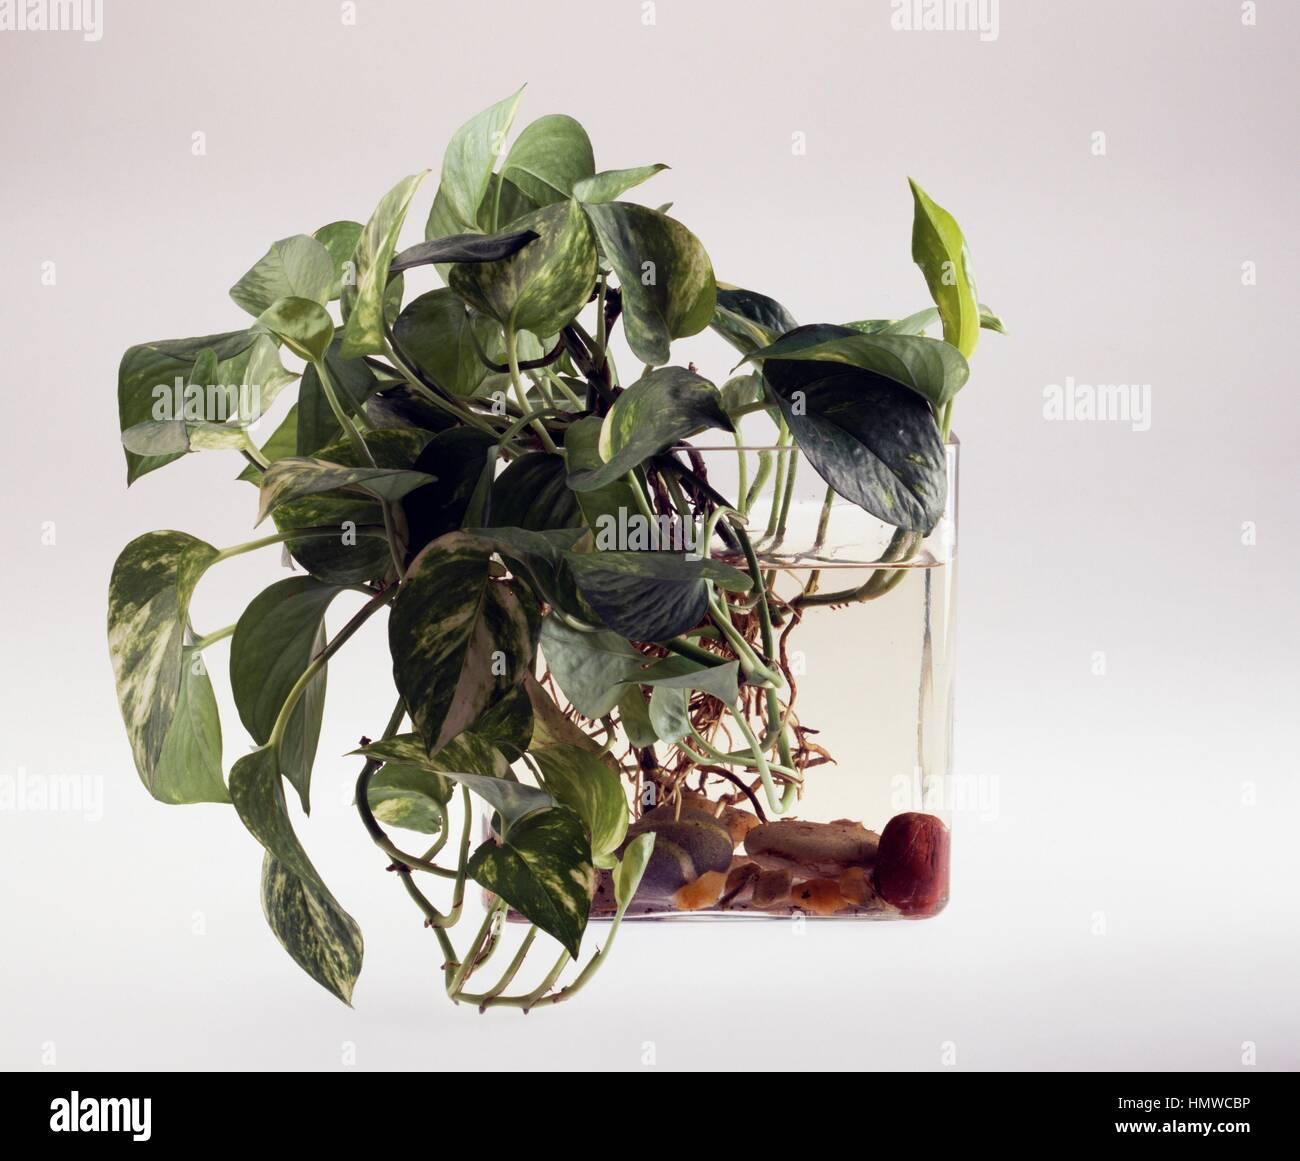 Potus (Potos sp), Araceae. - Stock Image